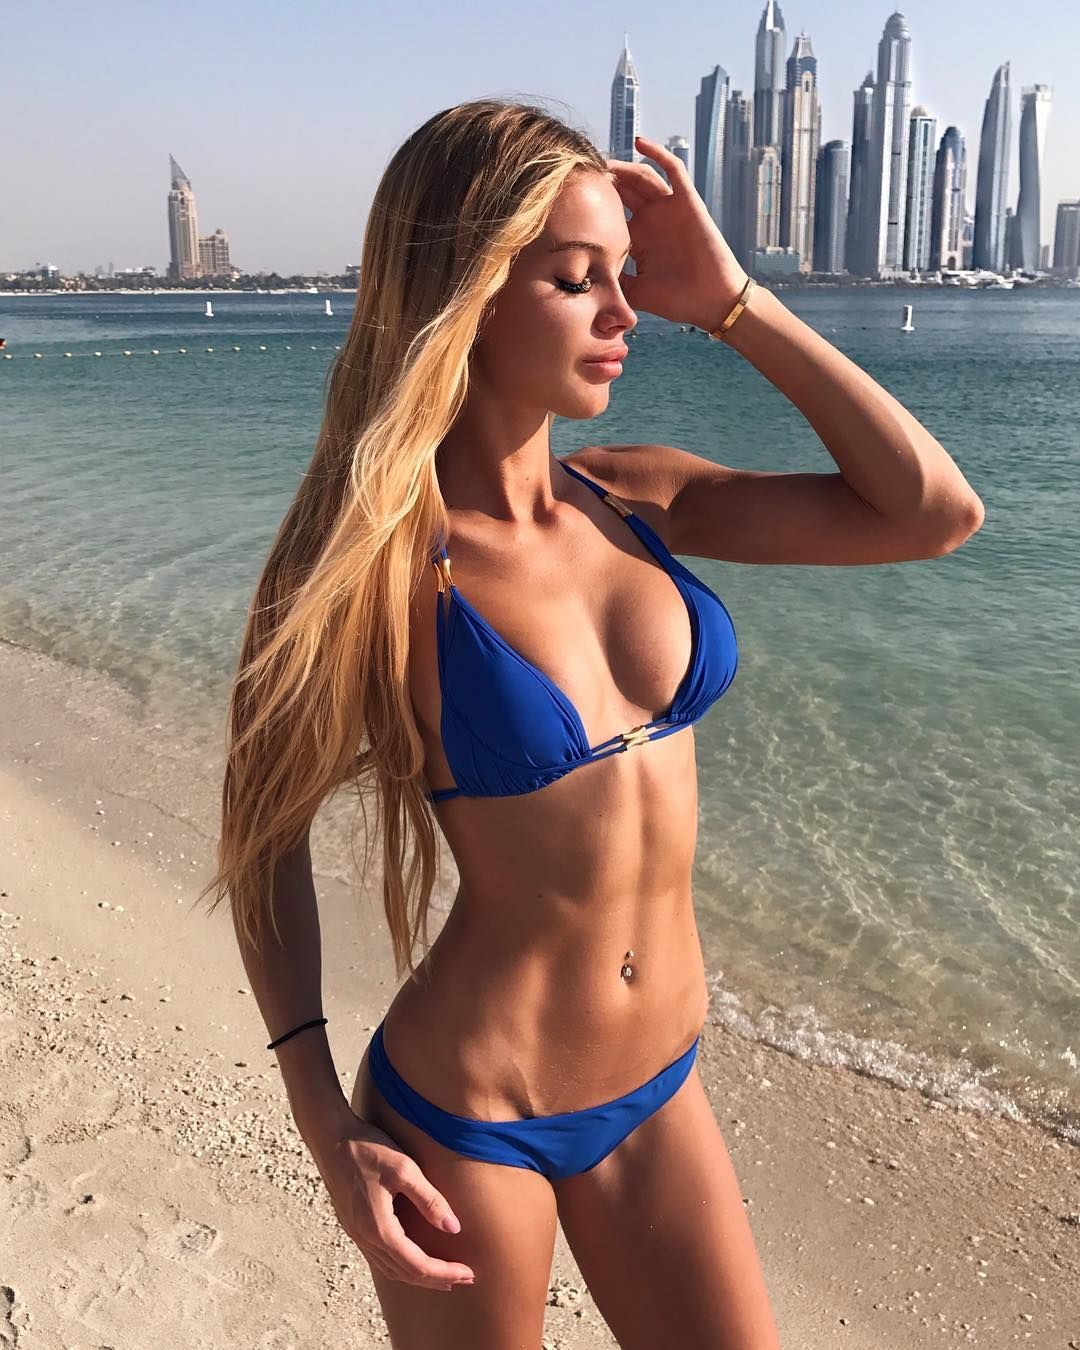 Images Jacinda Barrett nude photos 2019